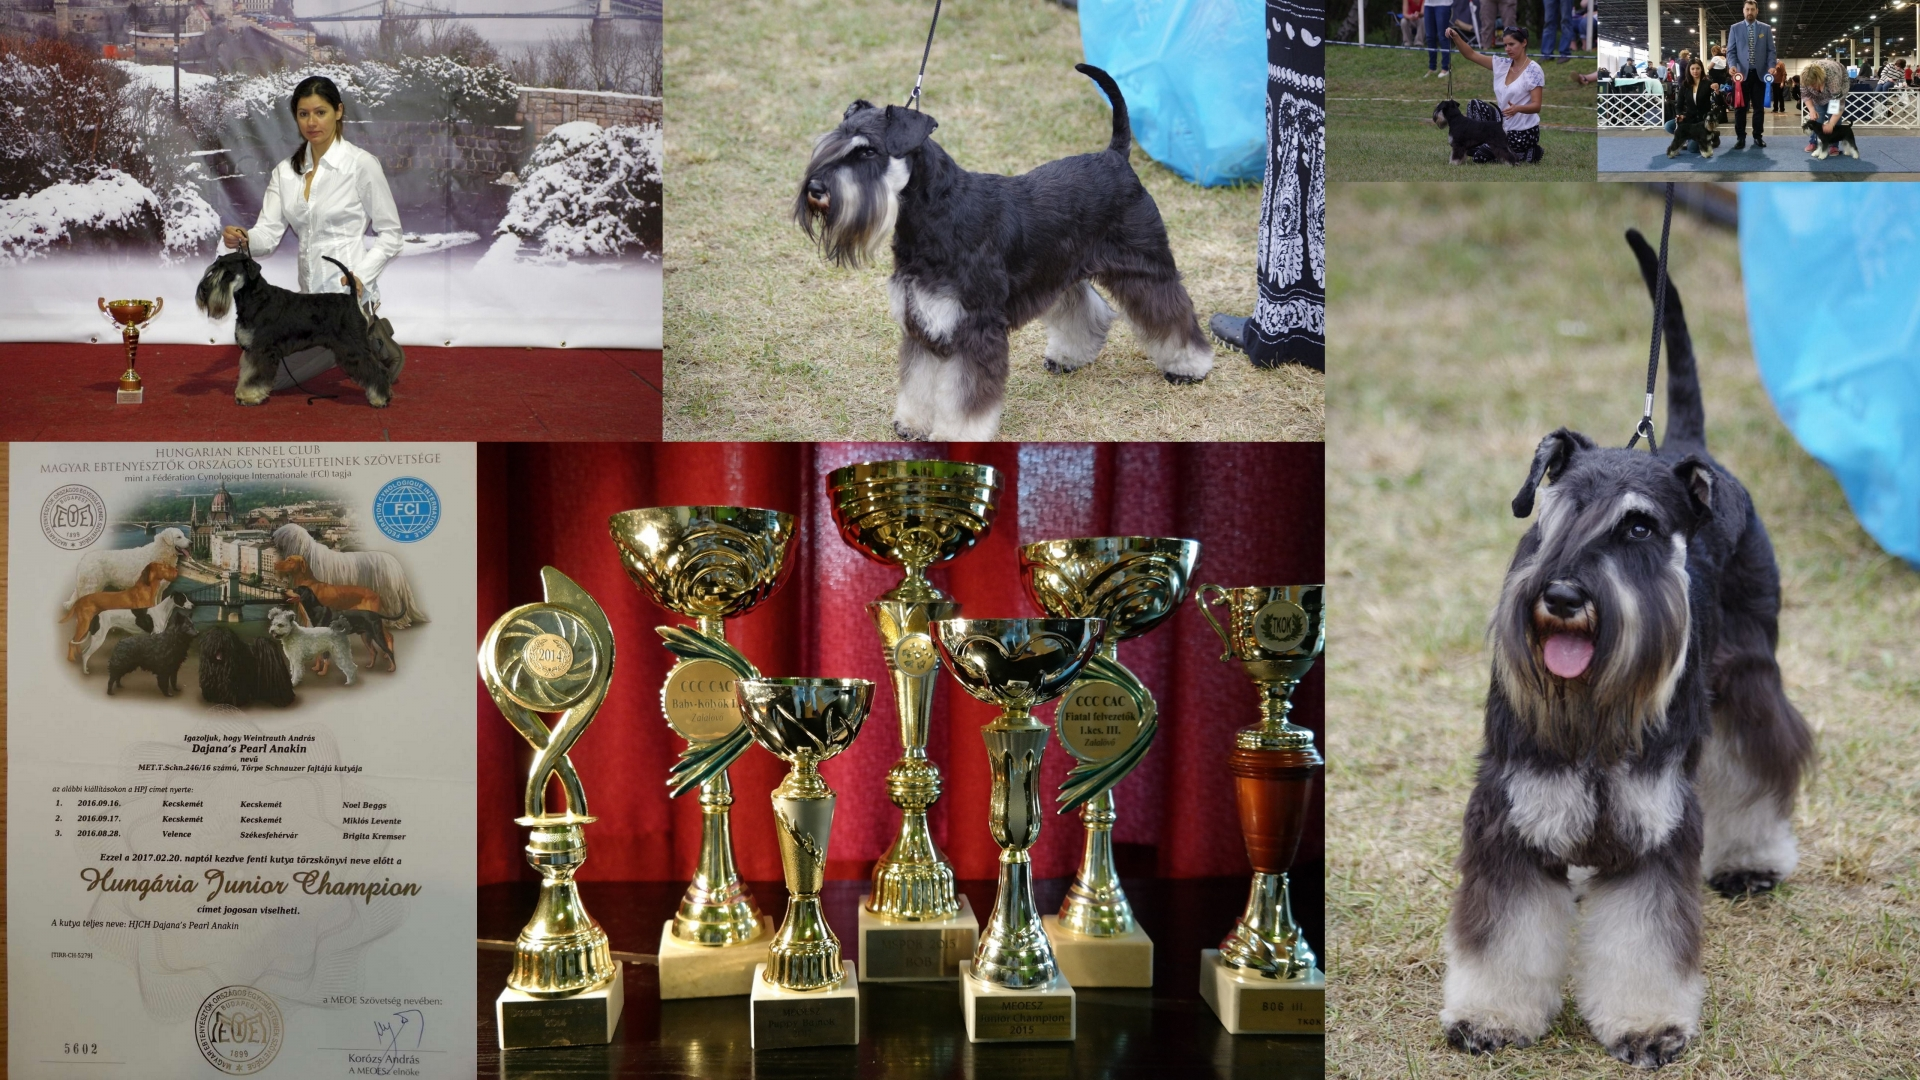 dajana's_pearl_anakin_fekete_ezüst_törpe_schnauzer_diploma_kiállítások_dog_show_black_and_silver_schnauzer_